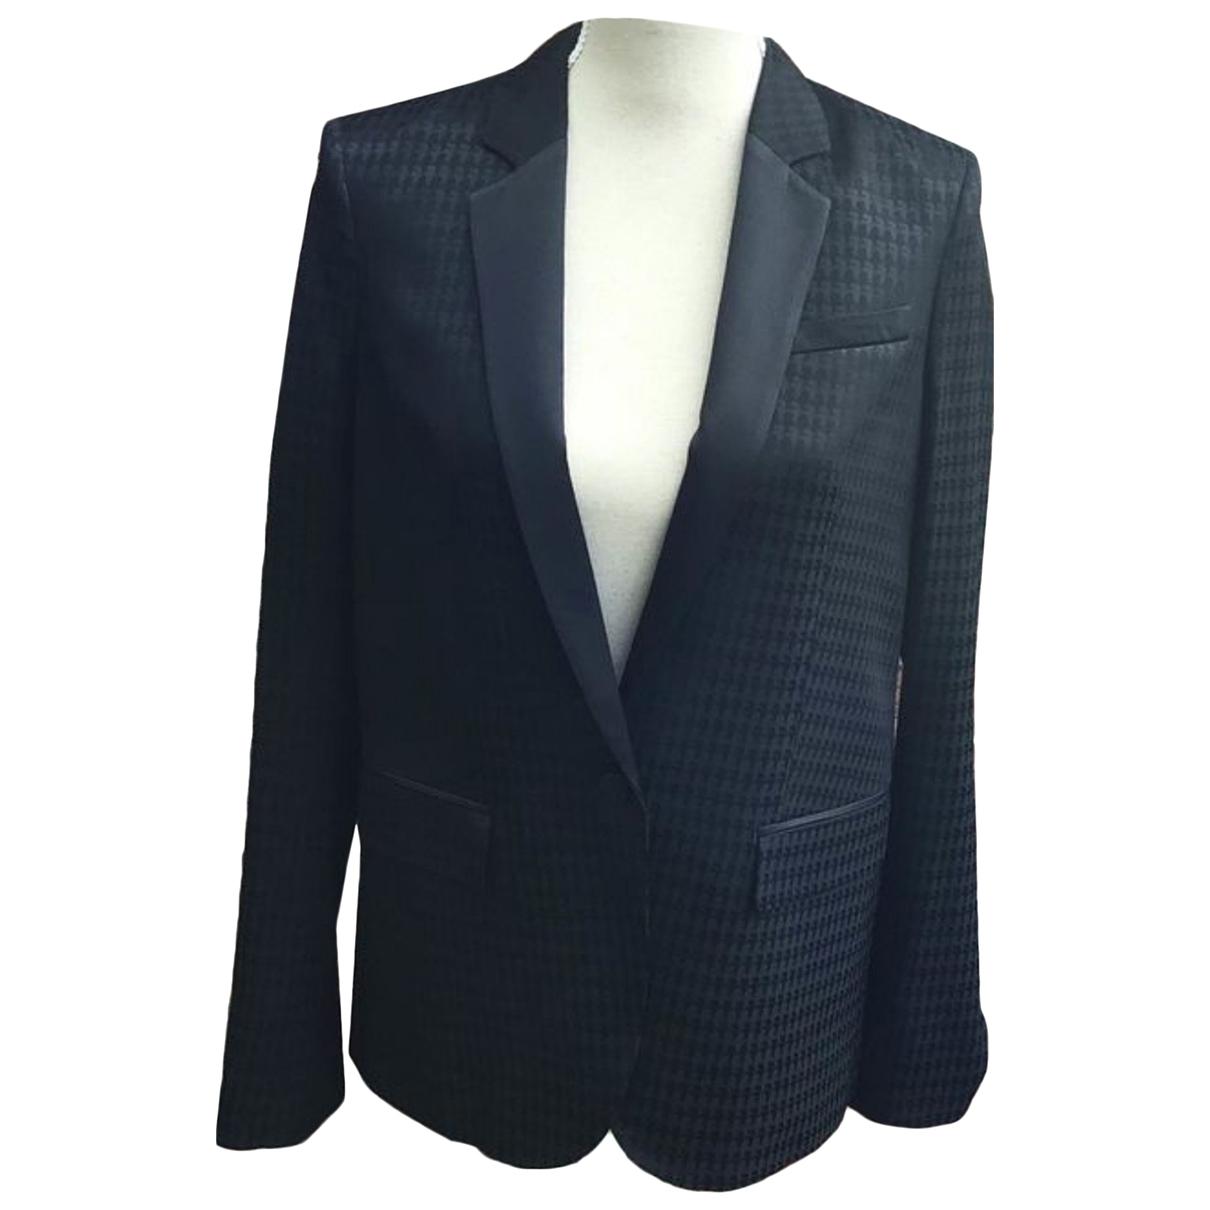 Karl Lagerfeld \N Jacke in  Schwarz Polyester